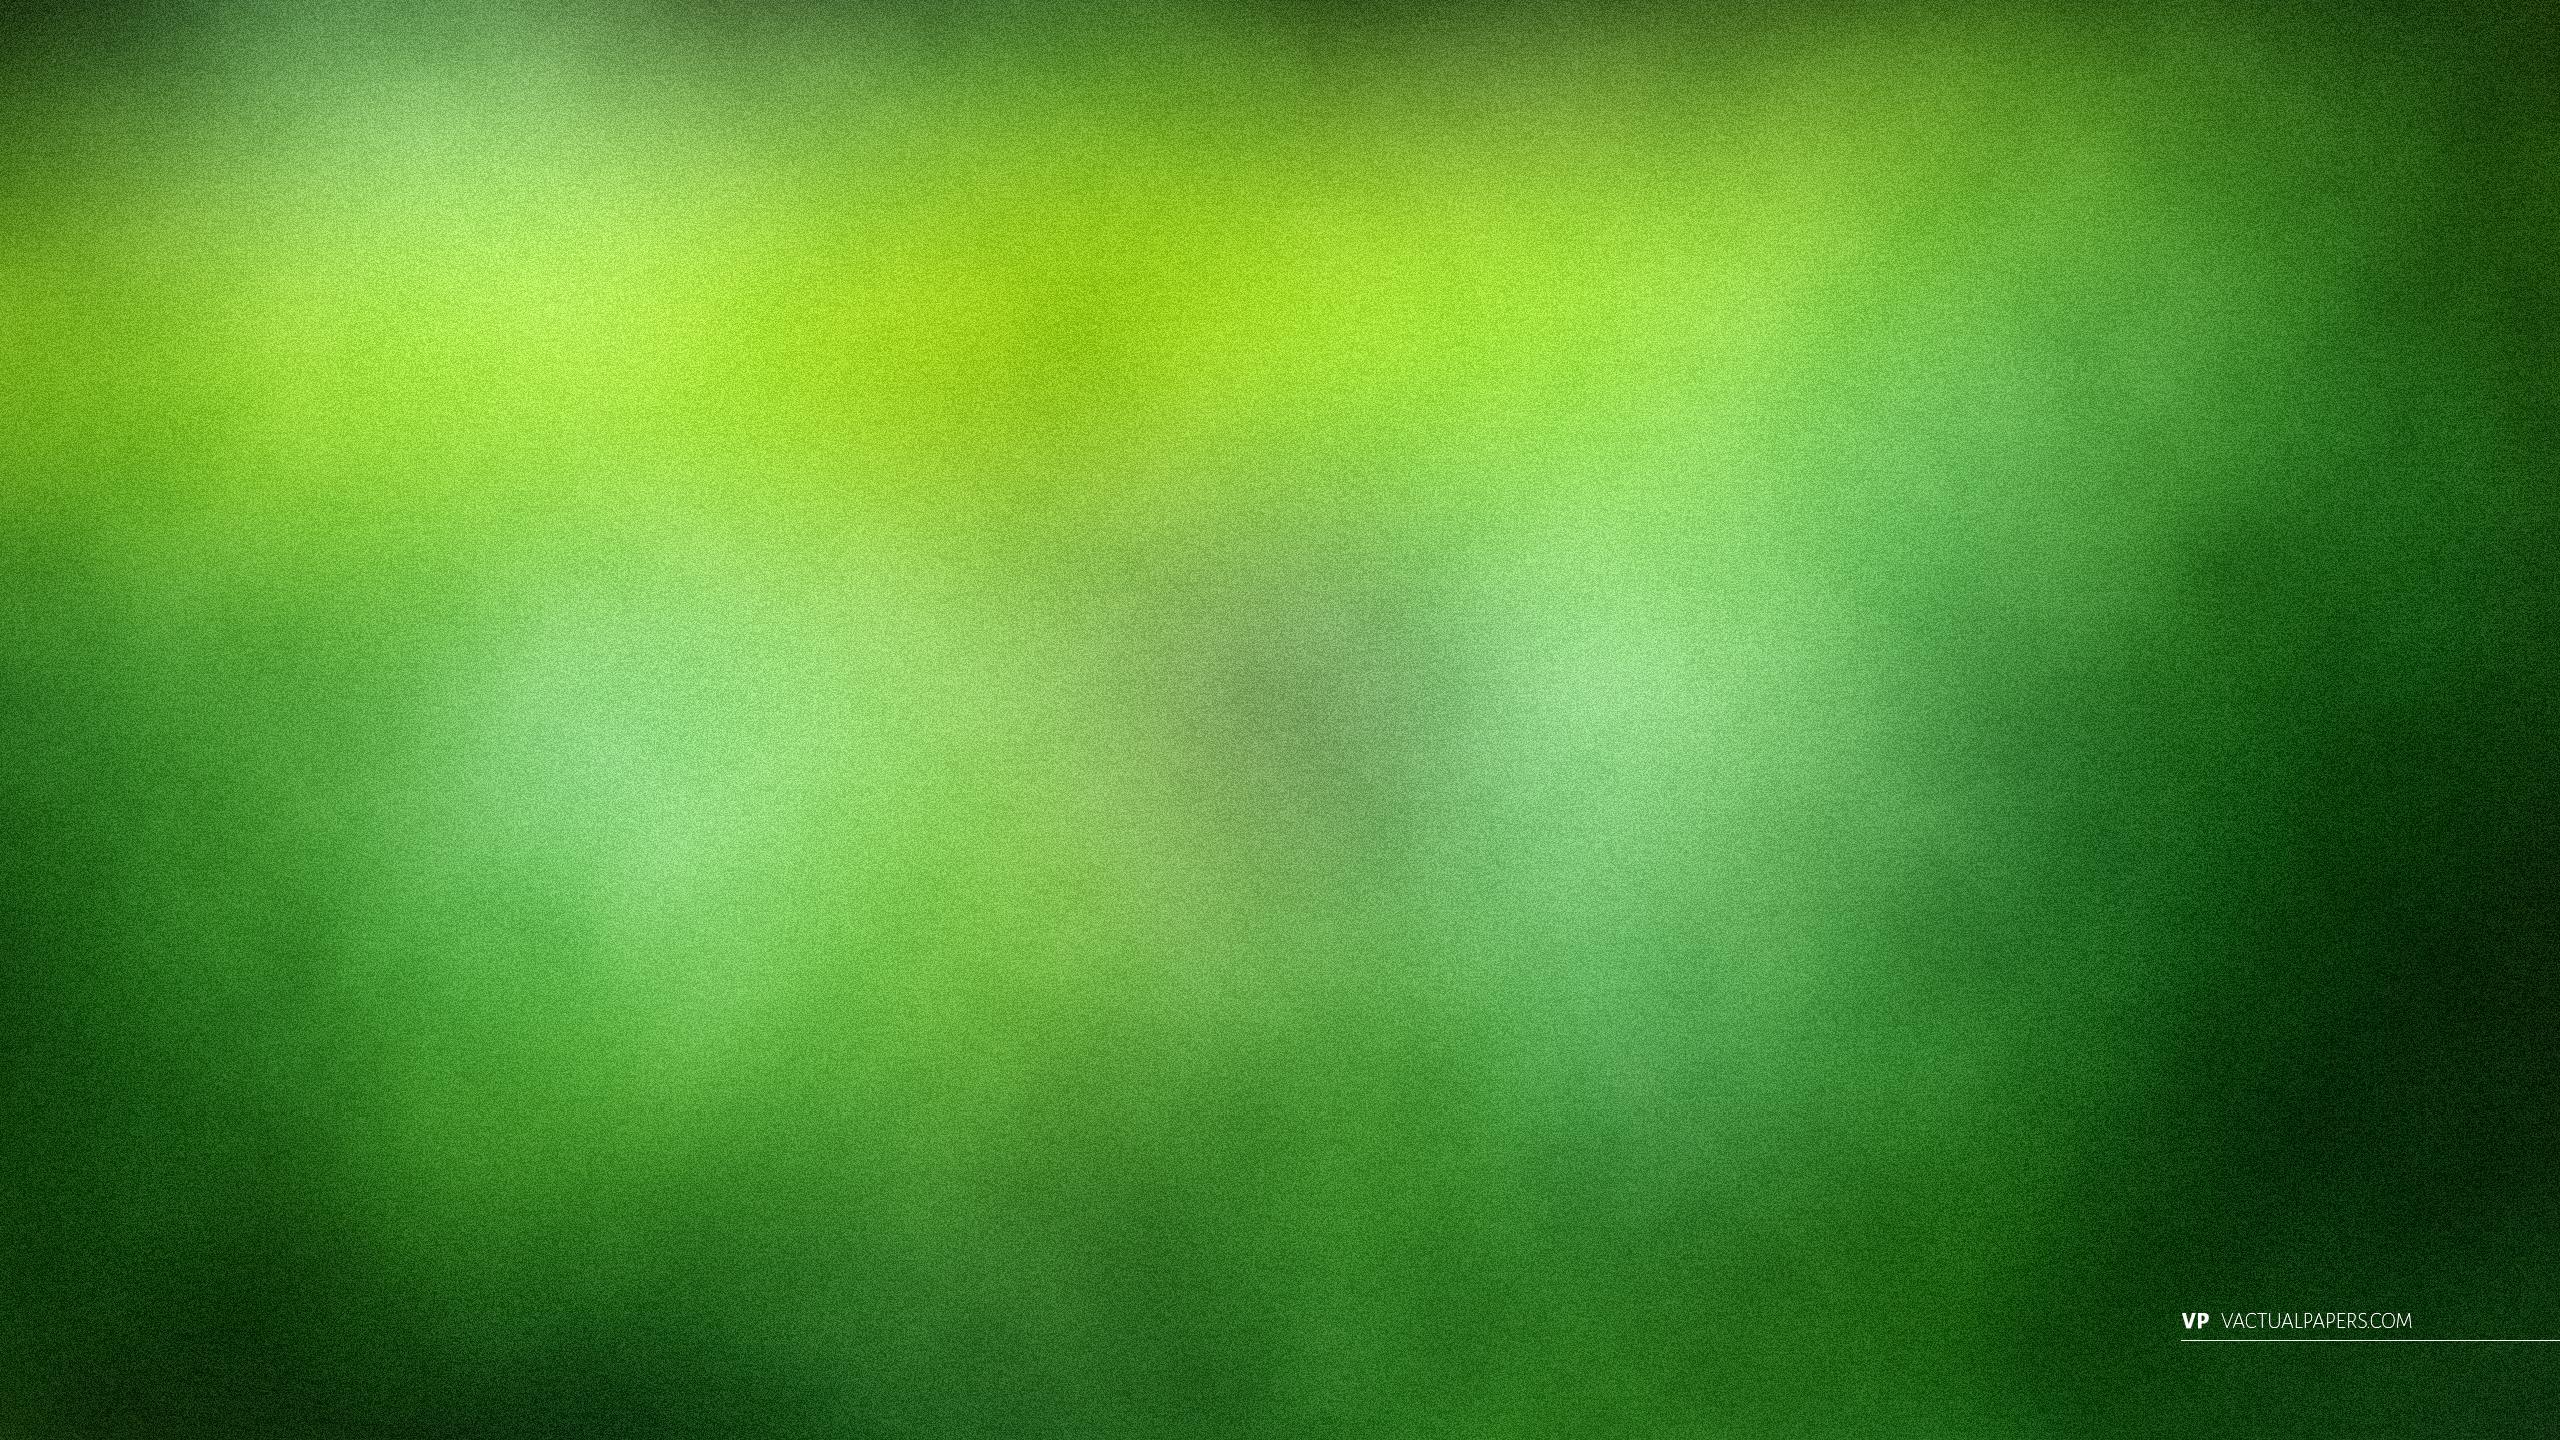 Abstract HD Wallpaper Blur Effects No 028 2560x1440.